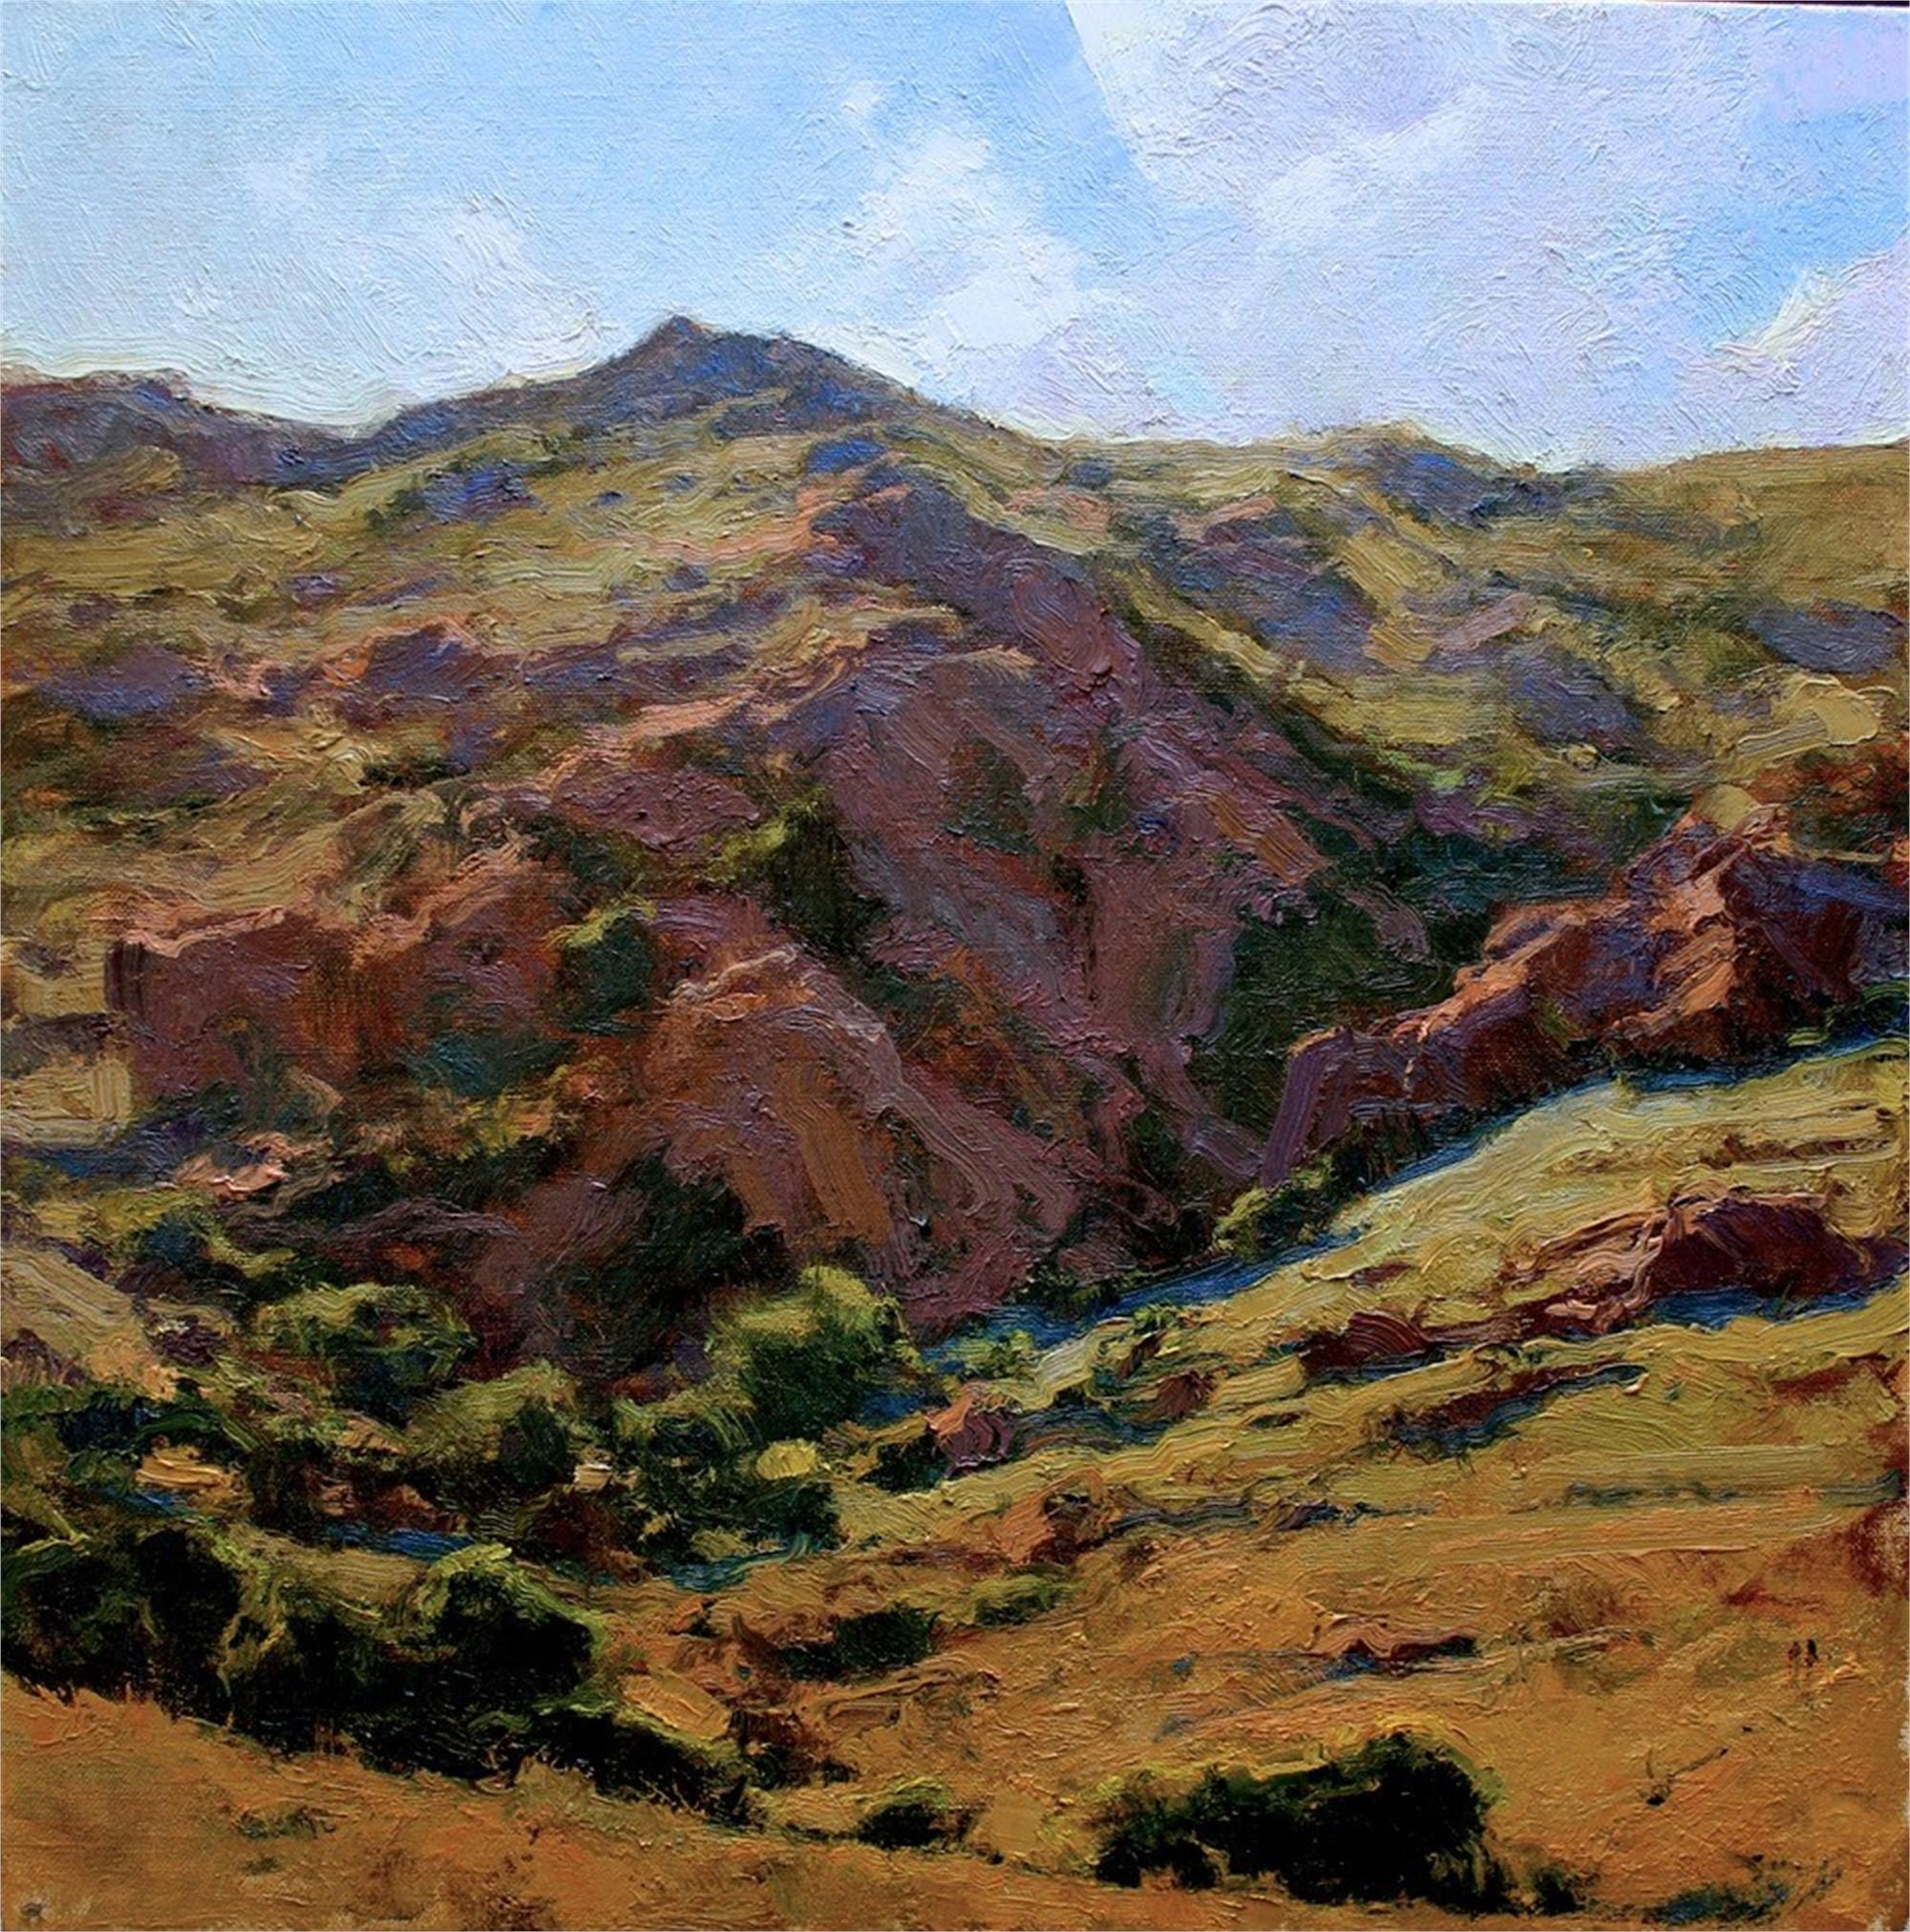 Canyon Shadow by Michael J Lynch